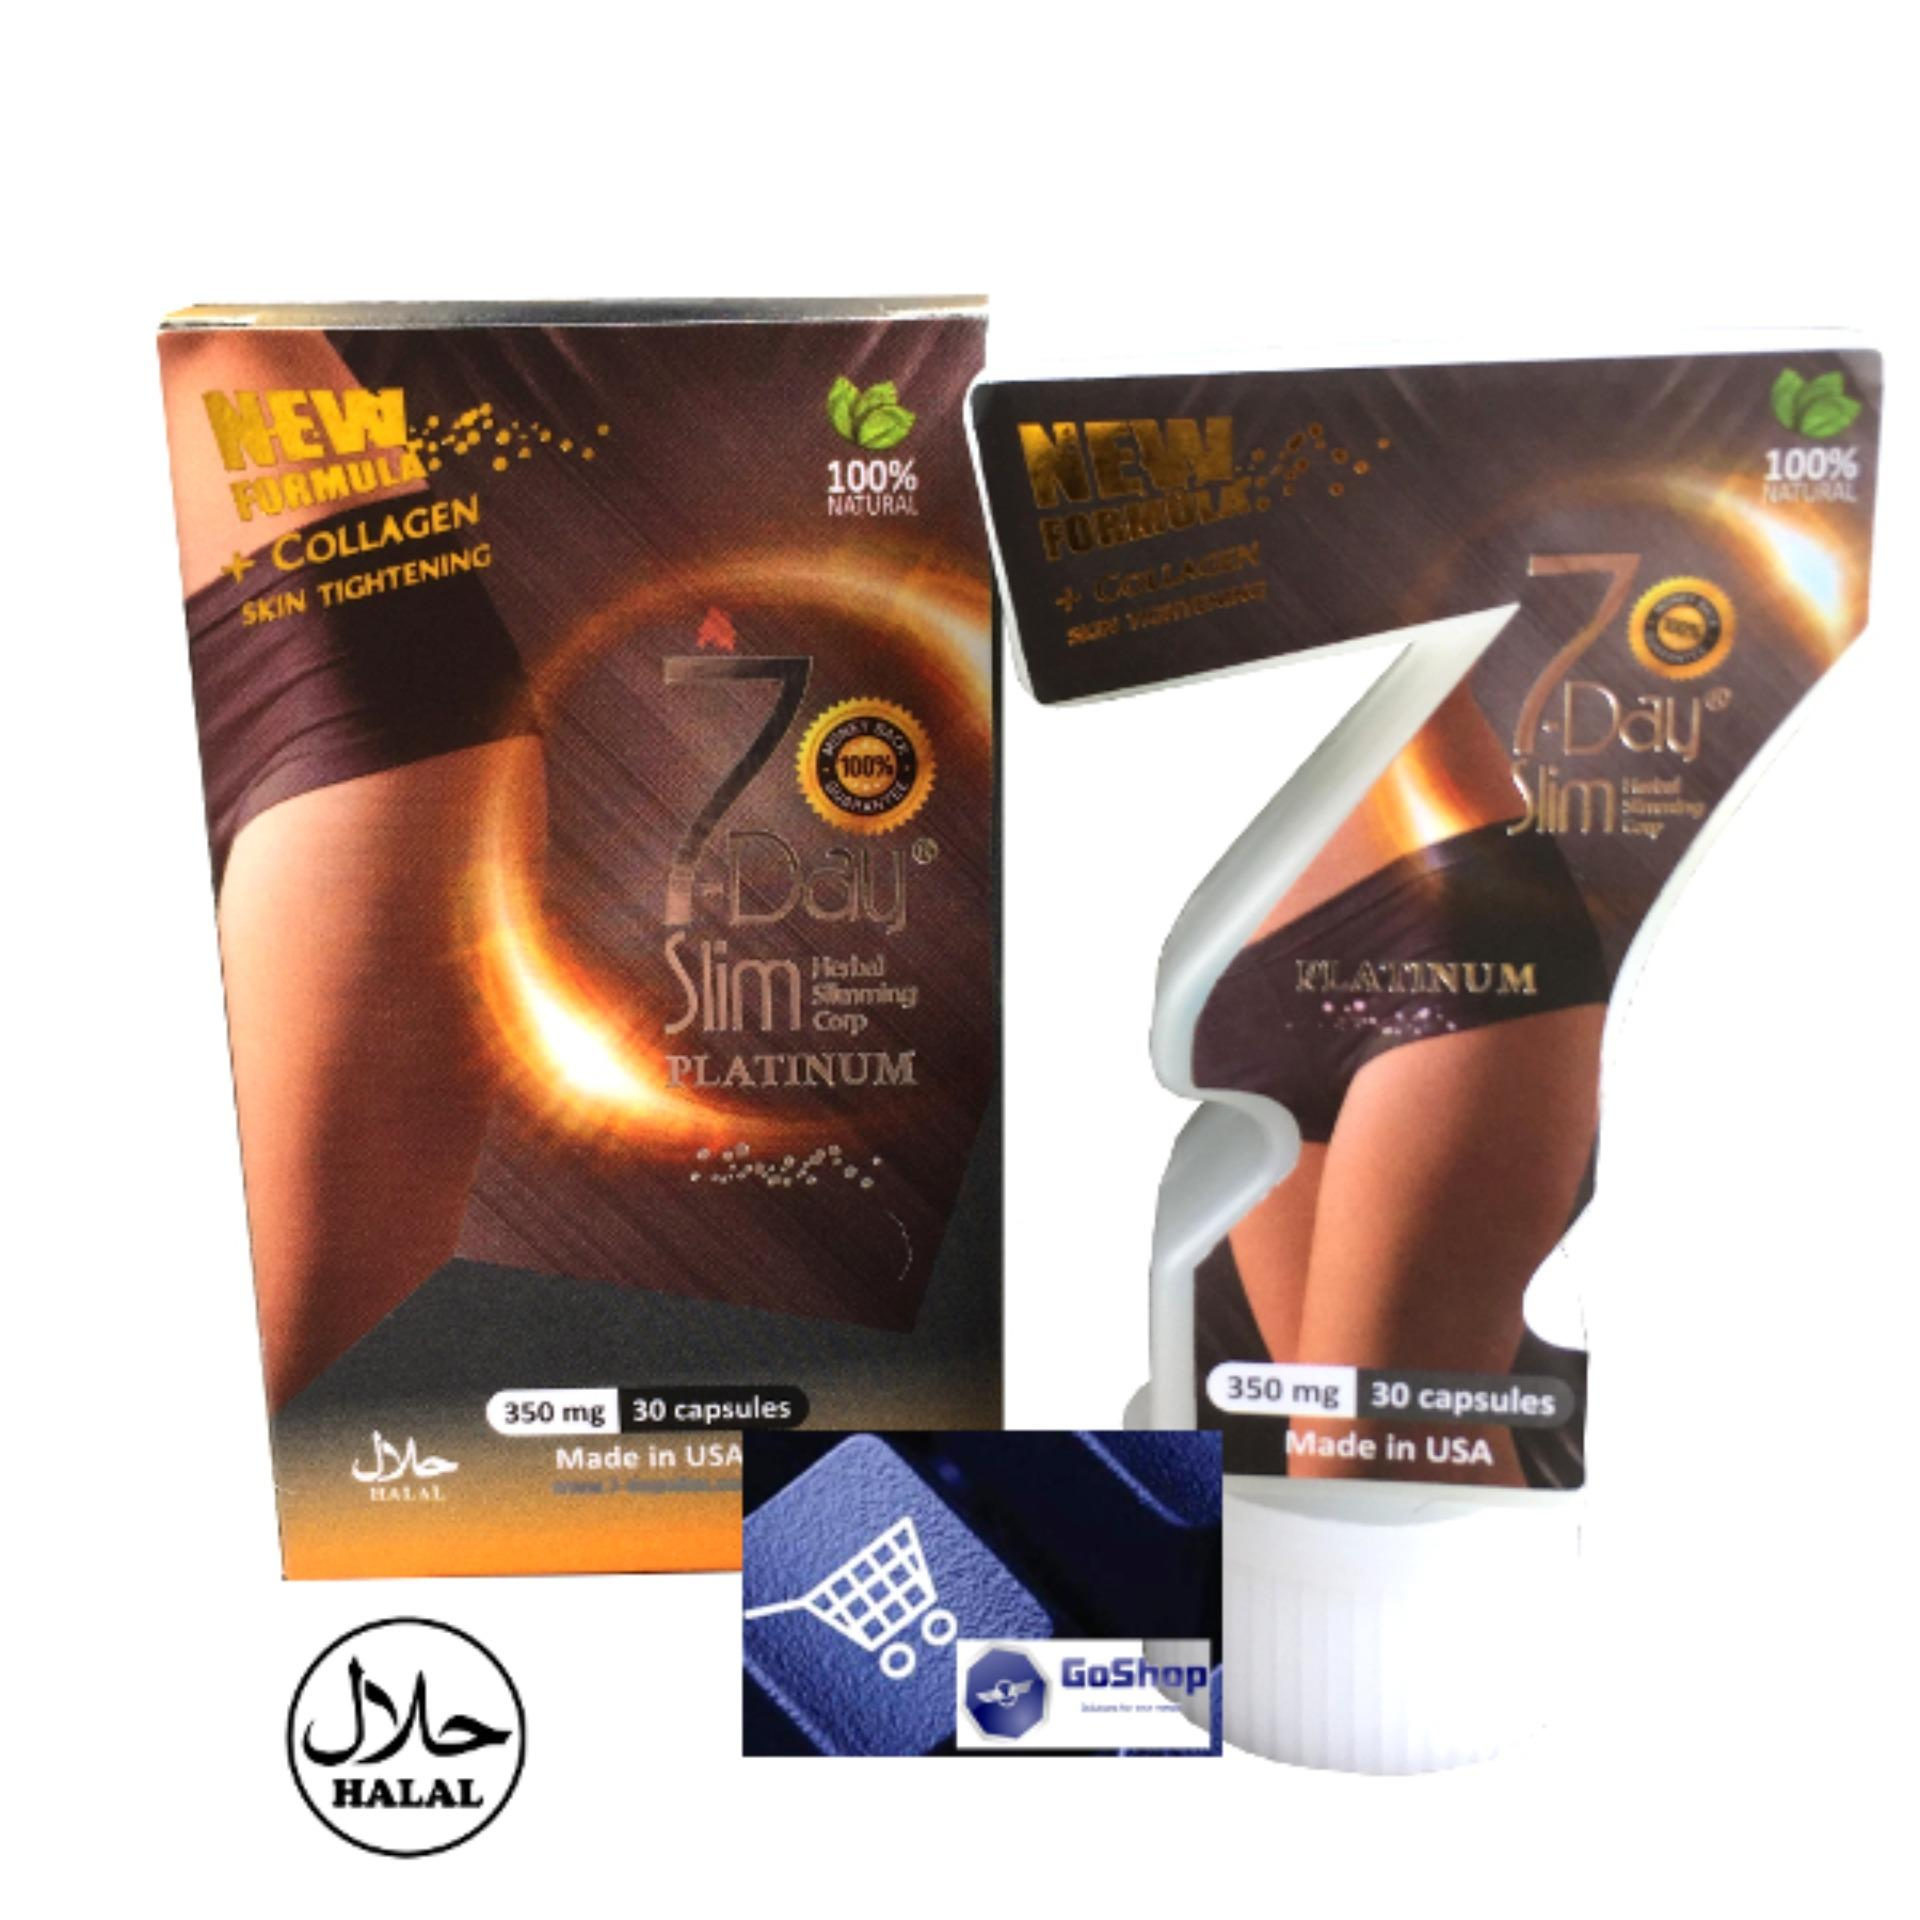 SUGAR BEAR HAIR VITAMINS ORIGINAL FROM USA (READY STOCK). Source · Flash Sale GoShop Suplement Diet Alami 7 Day Slim Plus Collagen Logo Halal - 30 Capsul